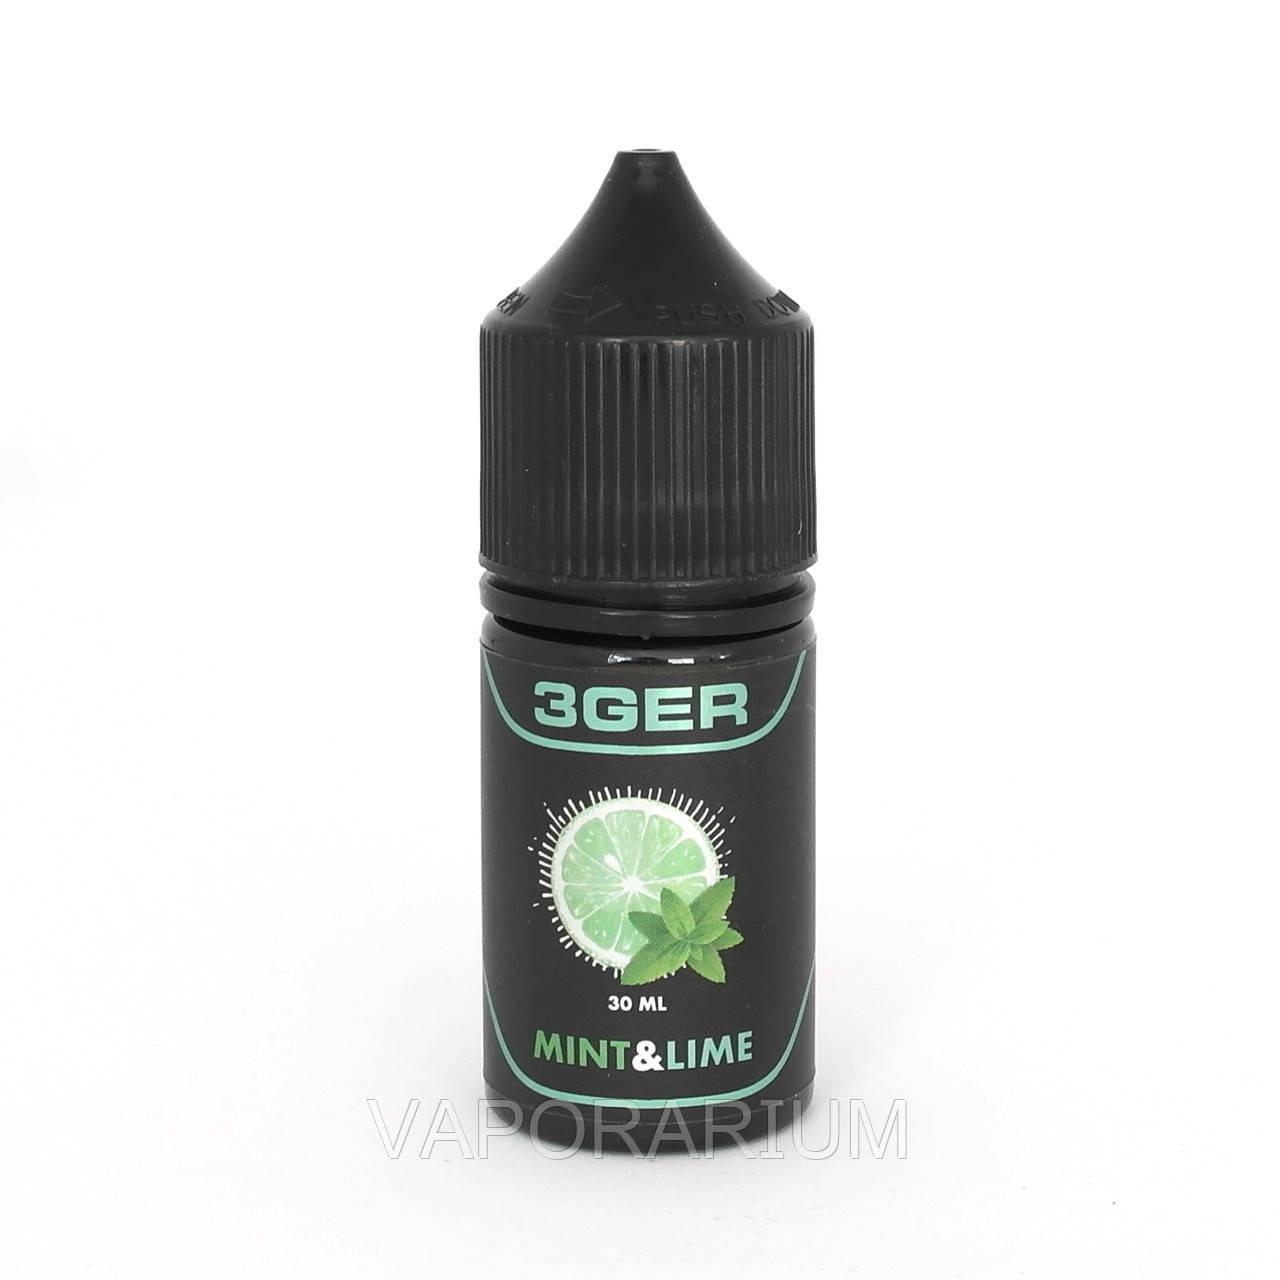 Жидкость для электронных сигарет 3Ger Charlies Mint Lime 1.5 мг 30 мл